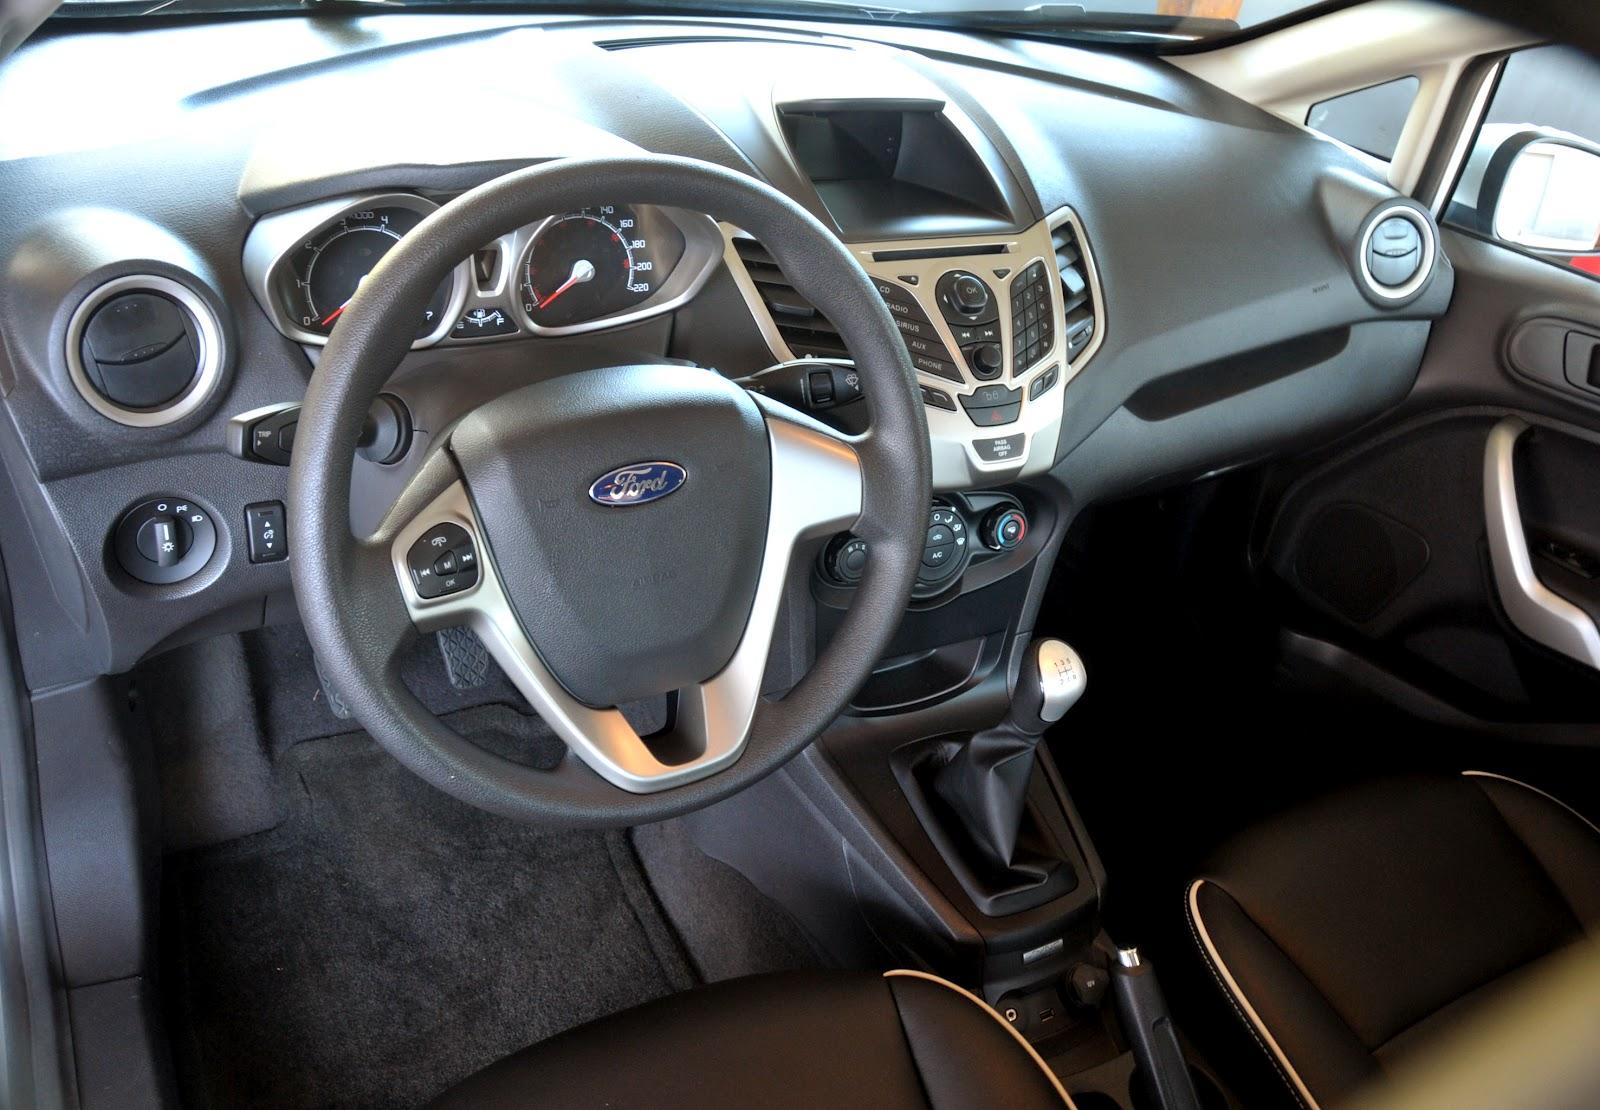 Blog do Moquenco  New Ford Fiesta Hatch 2012  Carrinho d643f3d06cf6c